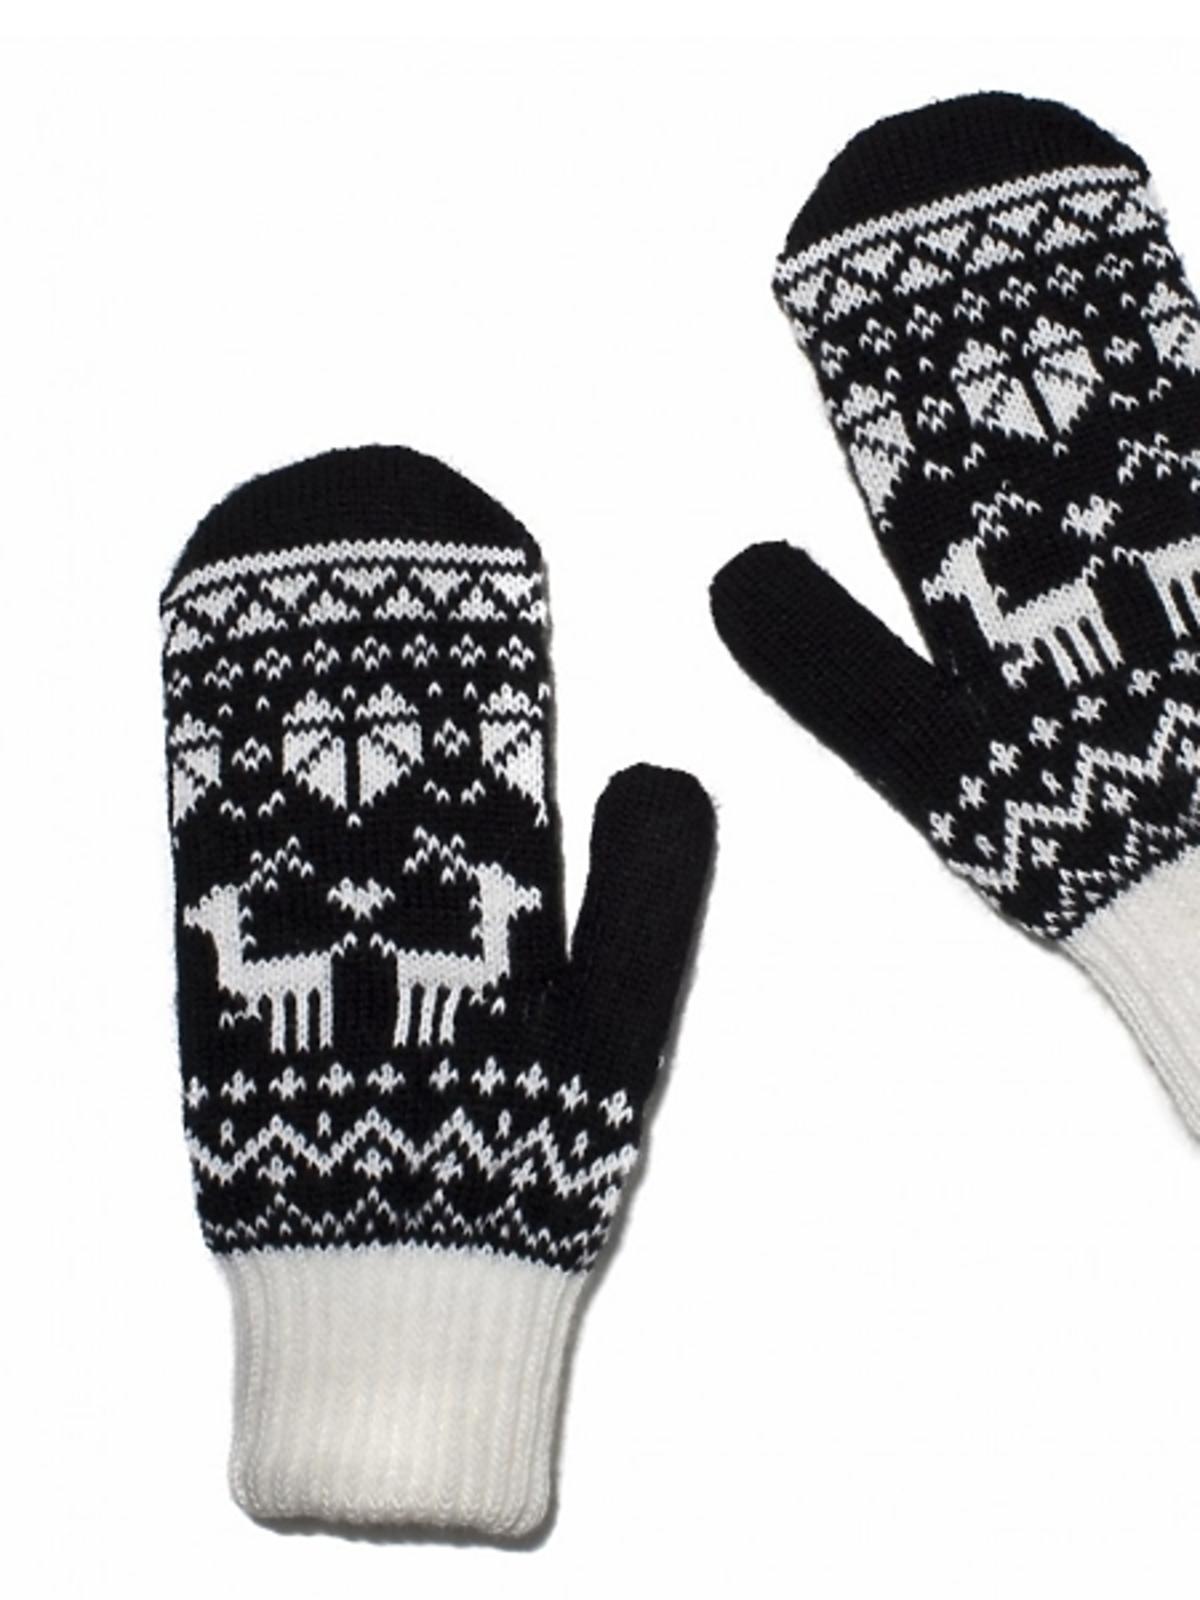 Rękawiczki Femi Pleasure, cena